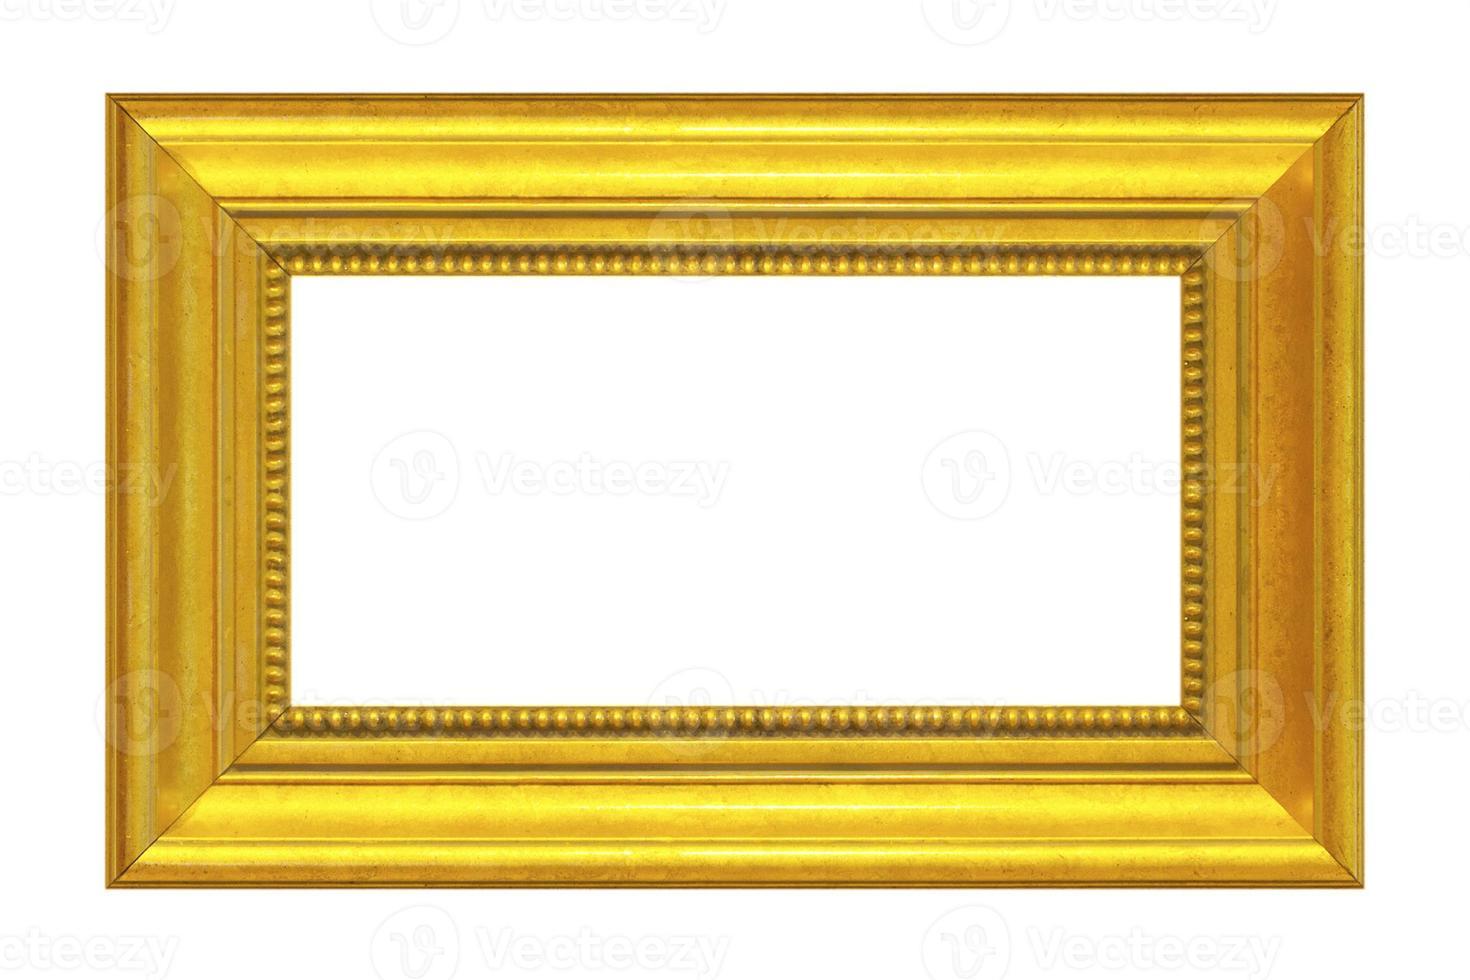 moldura de ouro isolada no fundo branco foto